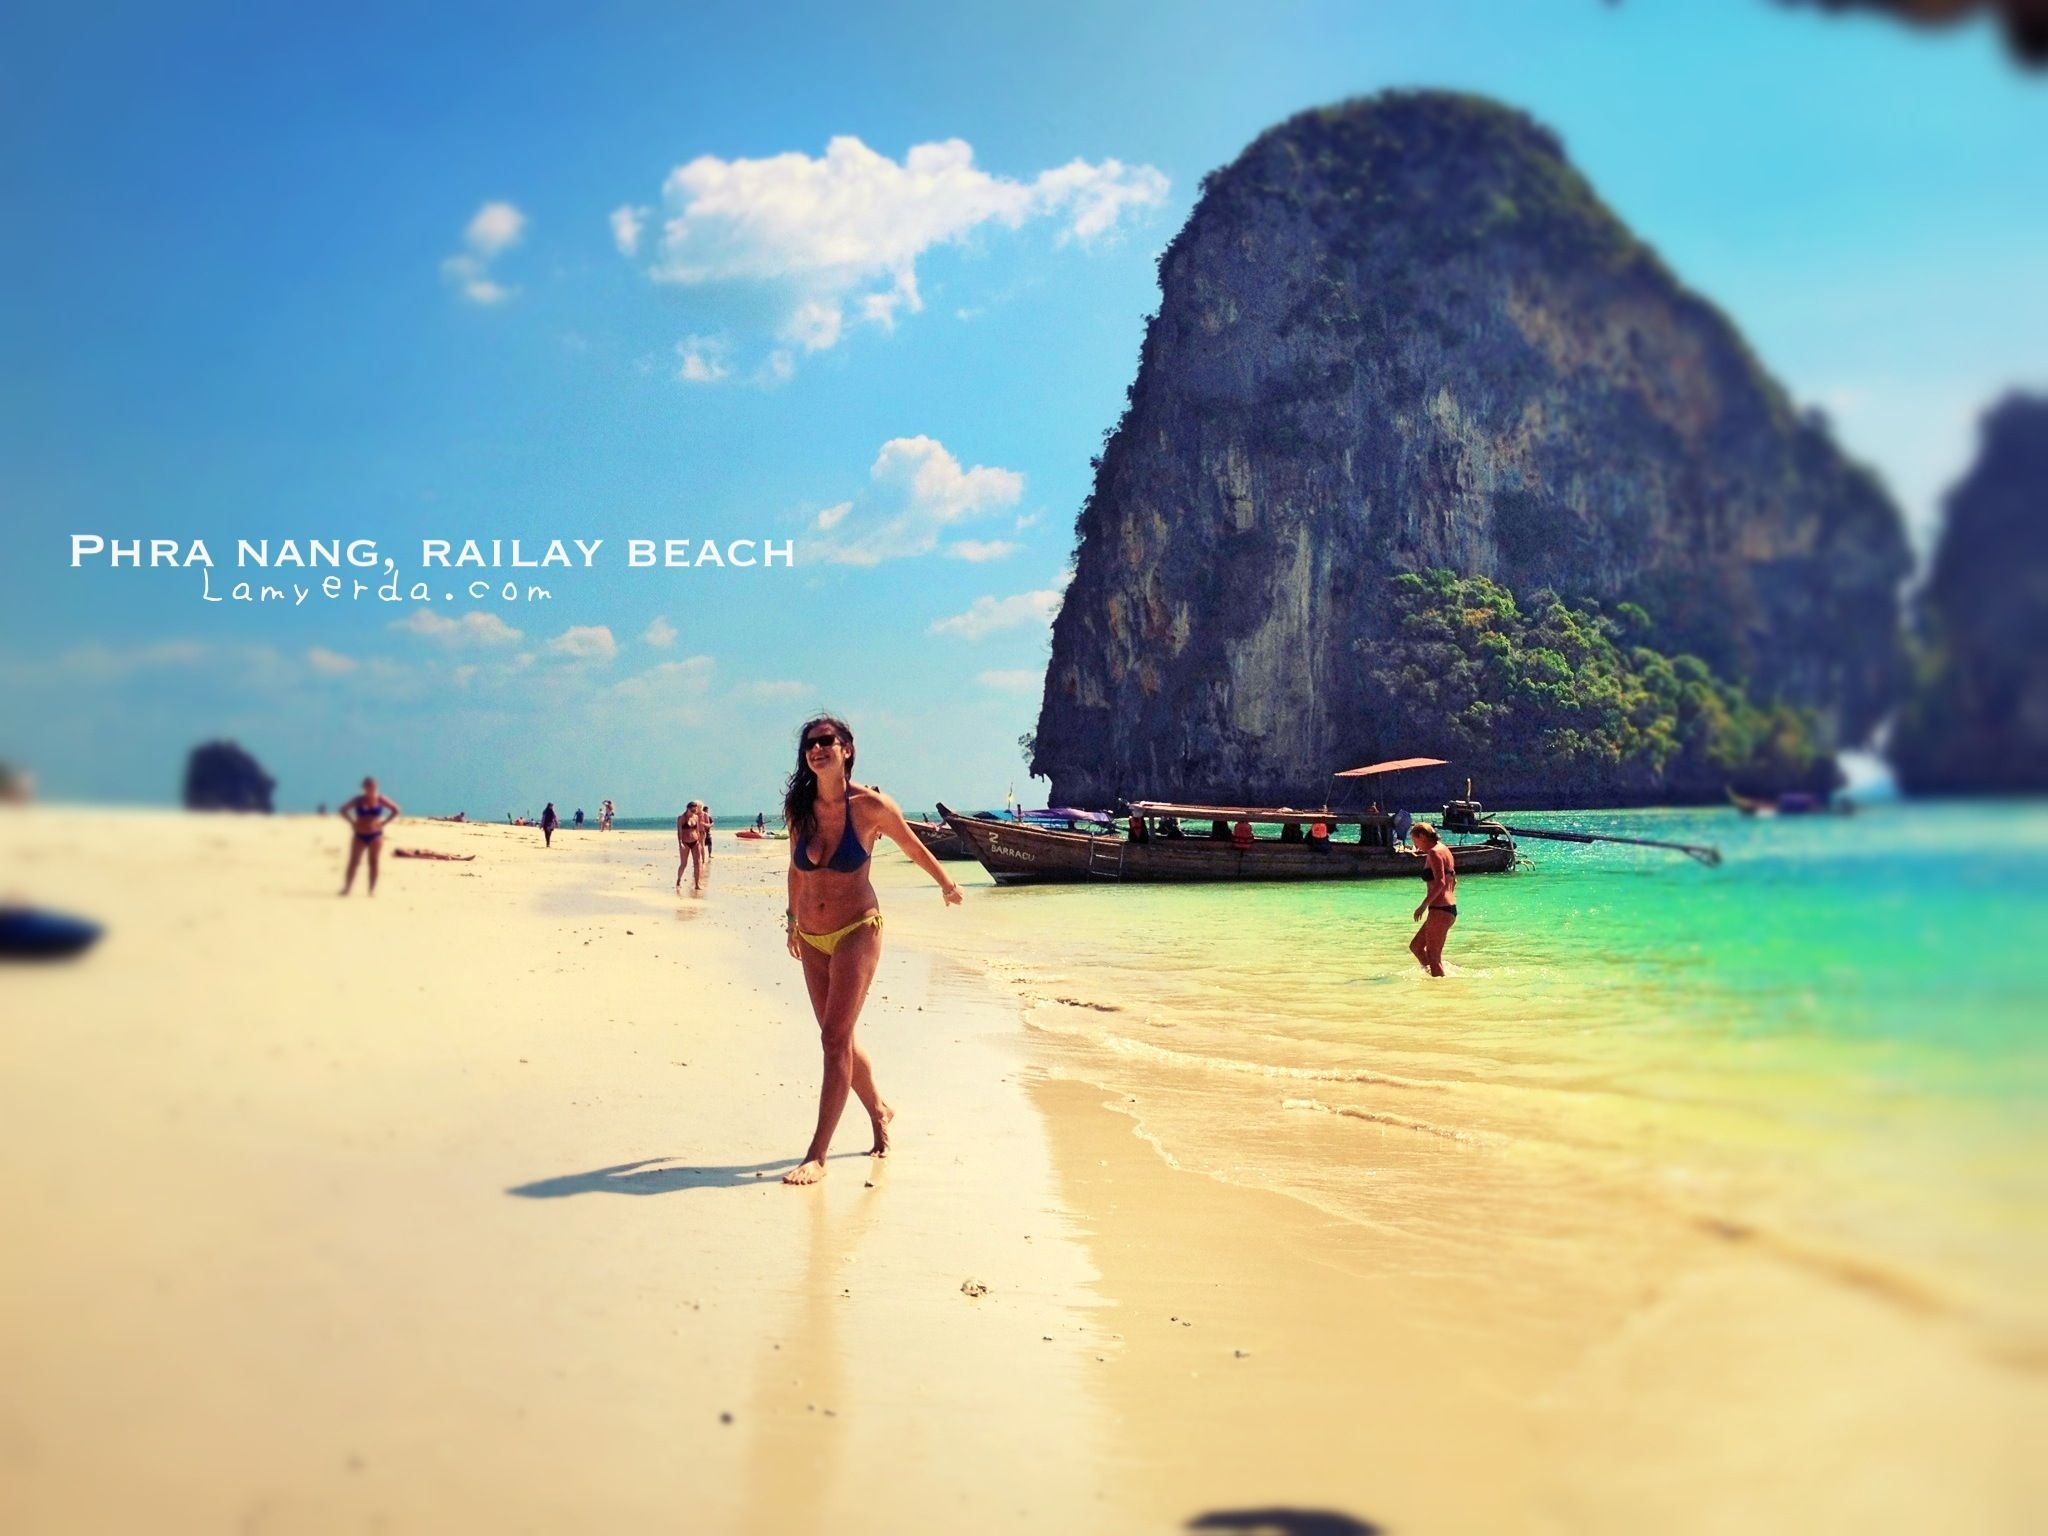 West Of Railay The Bizarre Cave And Phra Nang Beach Lamyerda